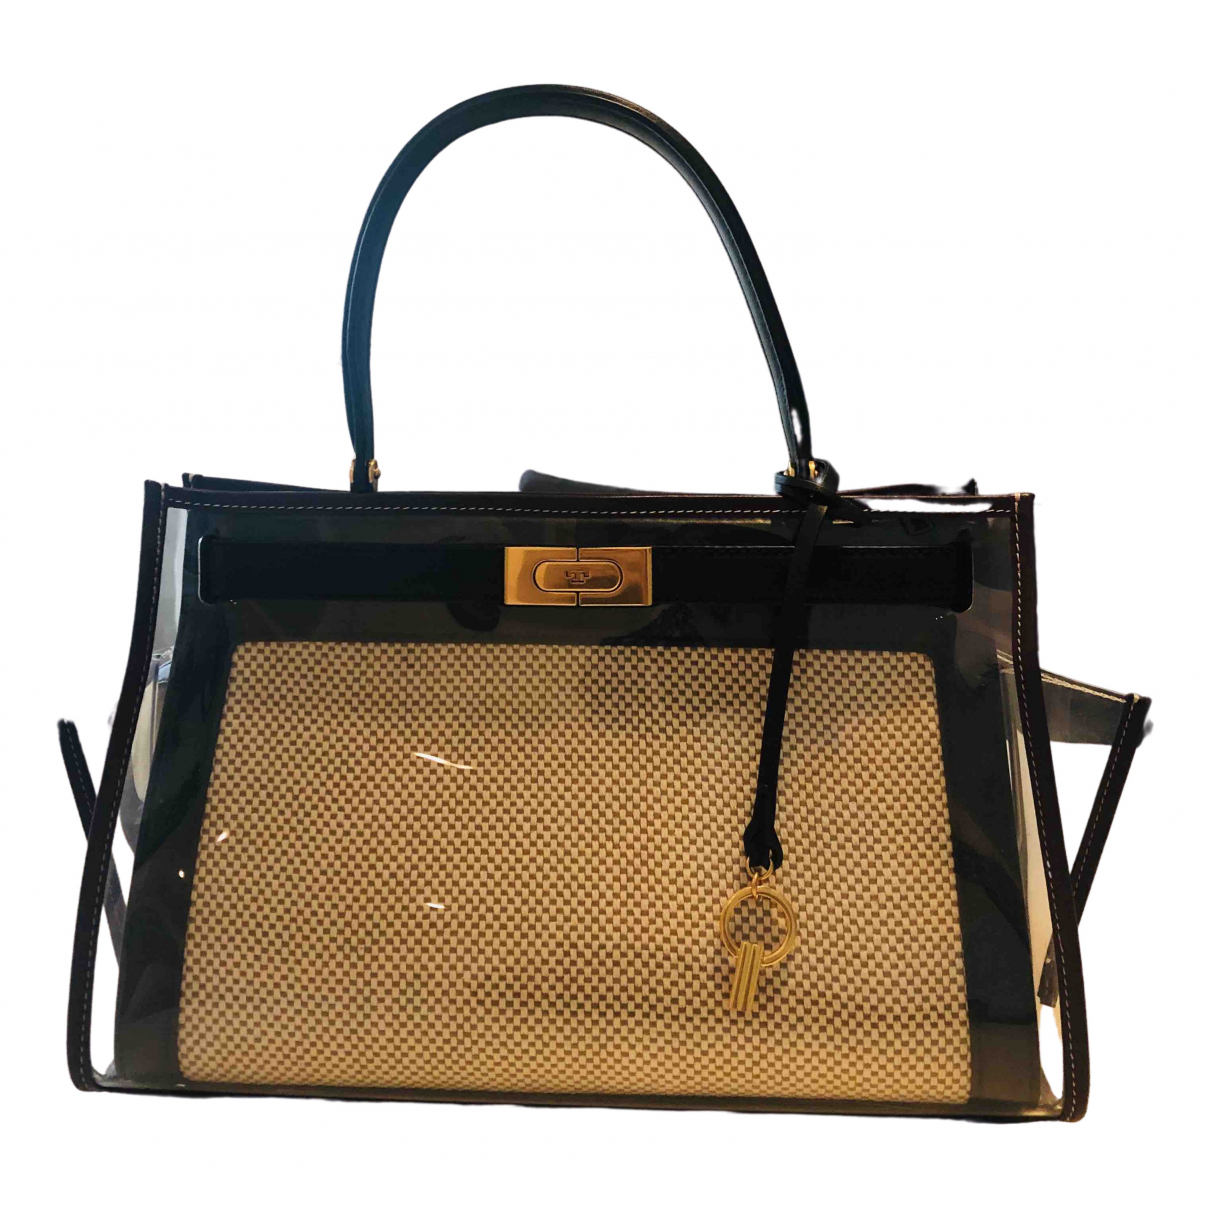 Tory Burch \N Handtasche in  Beige Leder